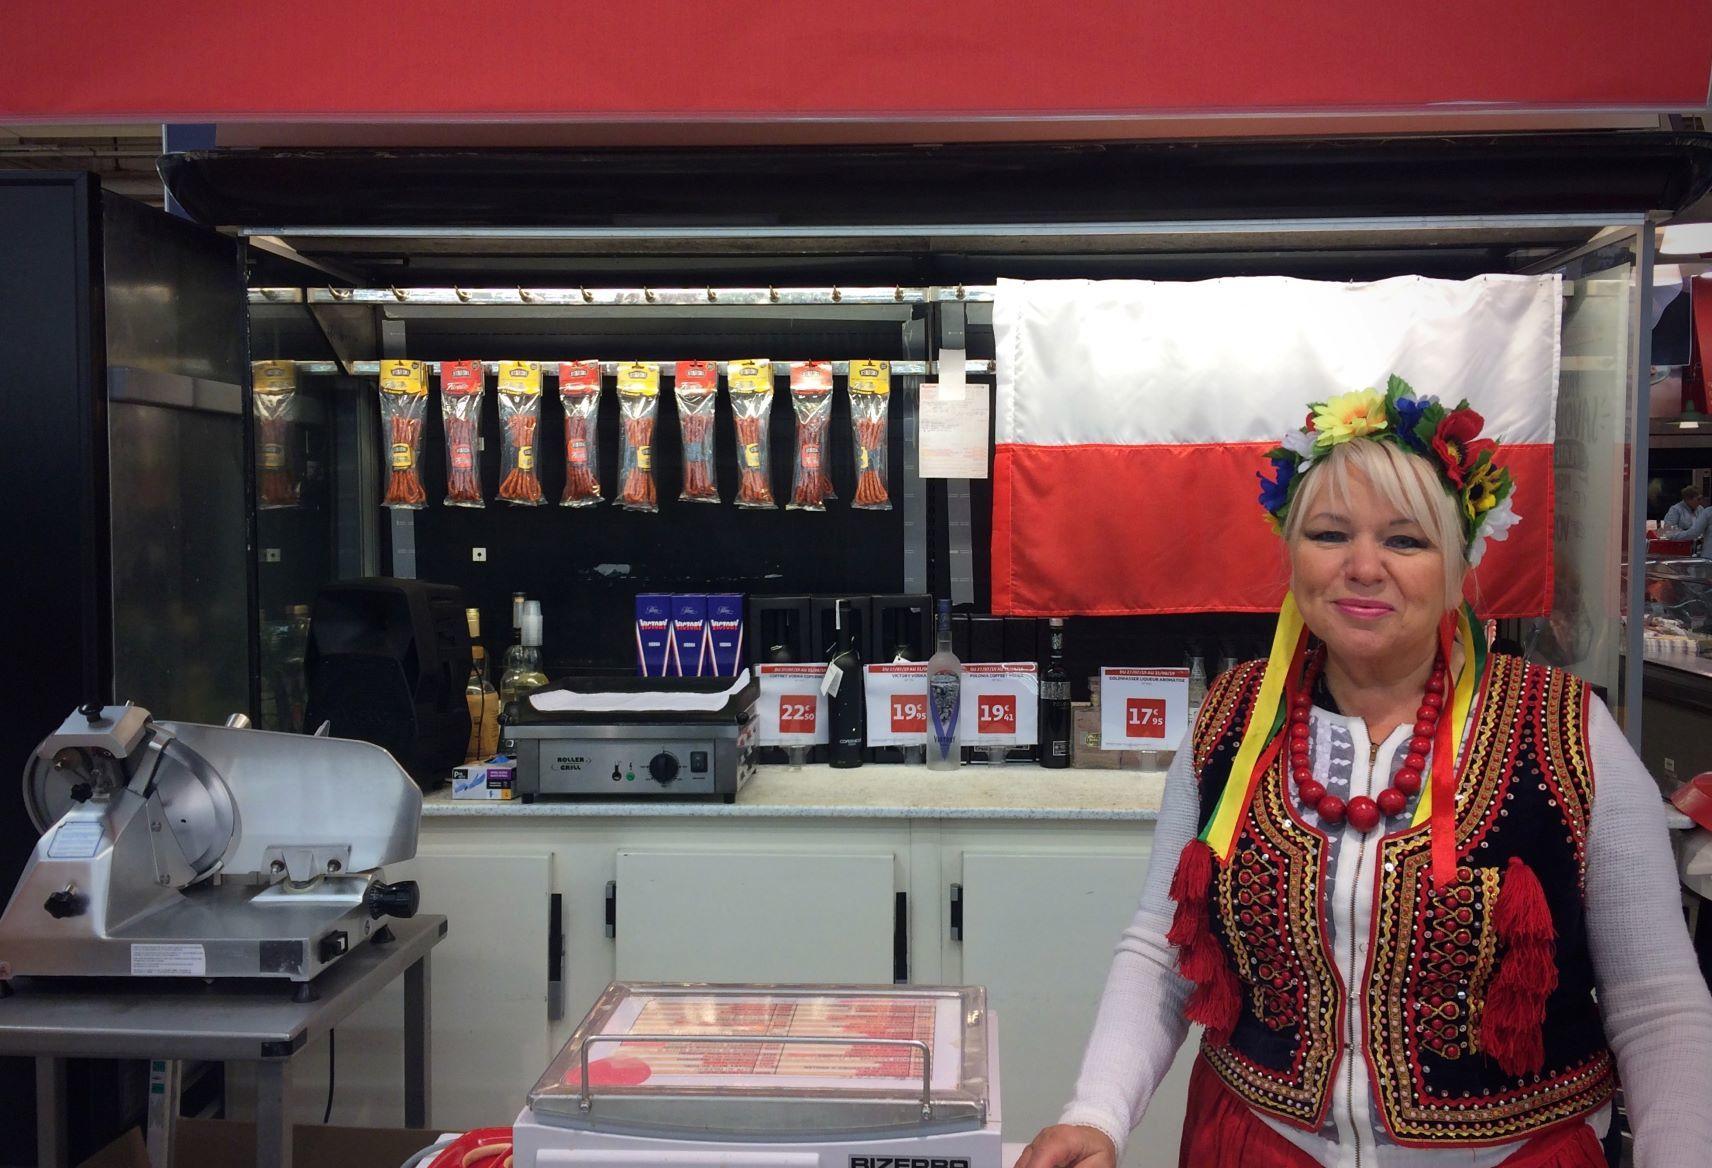 Auchan1